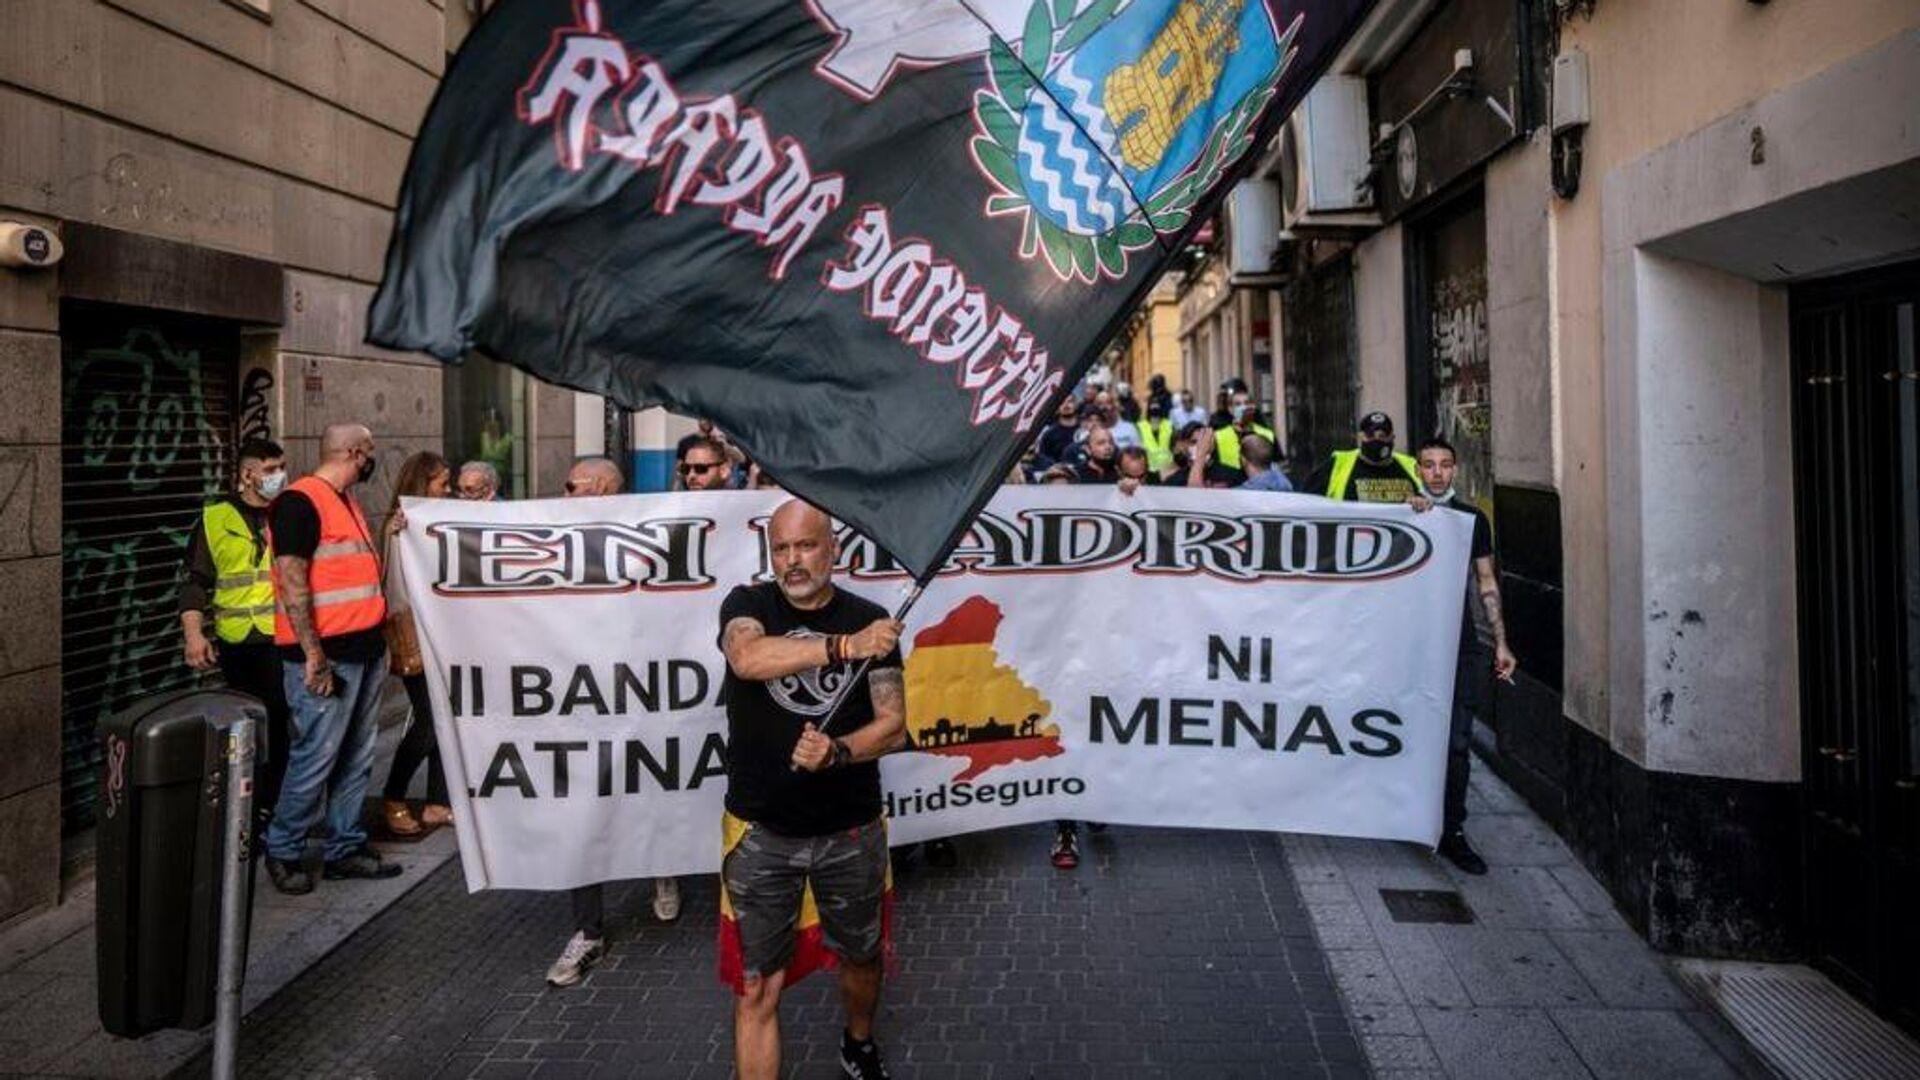 Manifestación neonazi en Chueca, Madrid - Sputnik Mundo, 1920, 03.10.2021